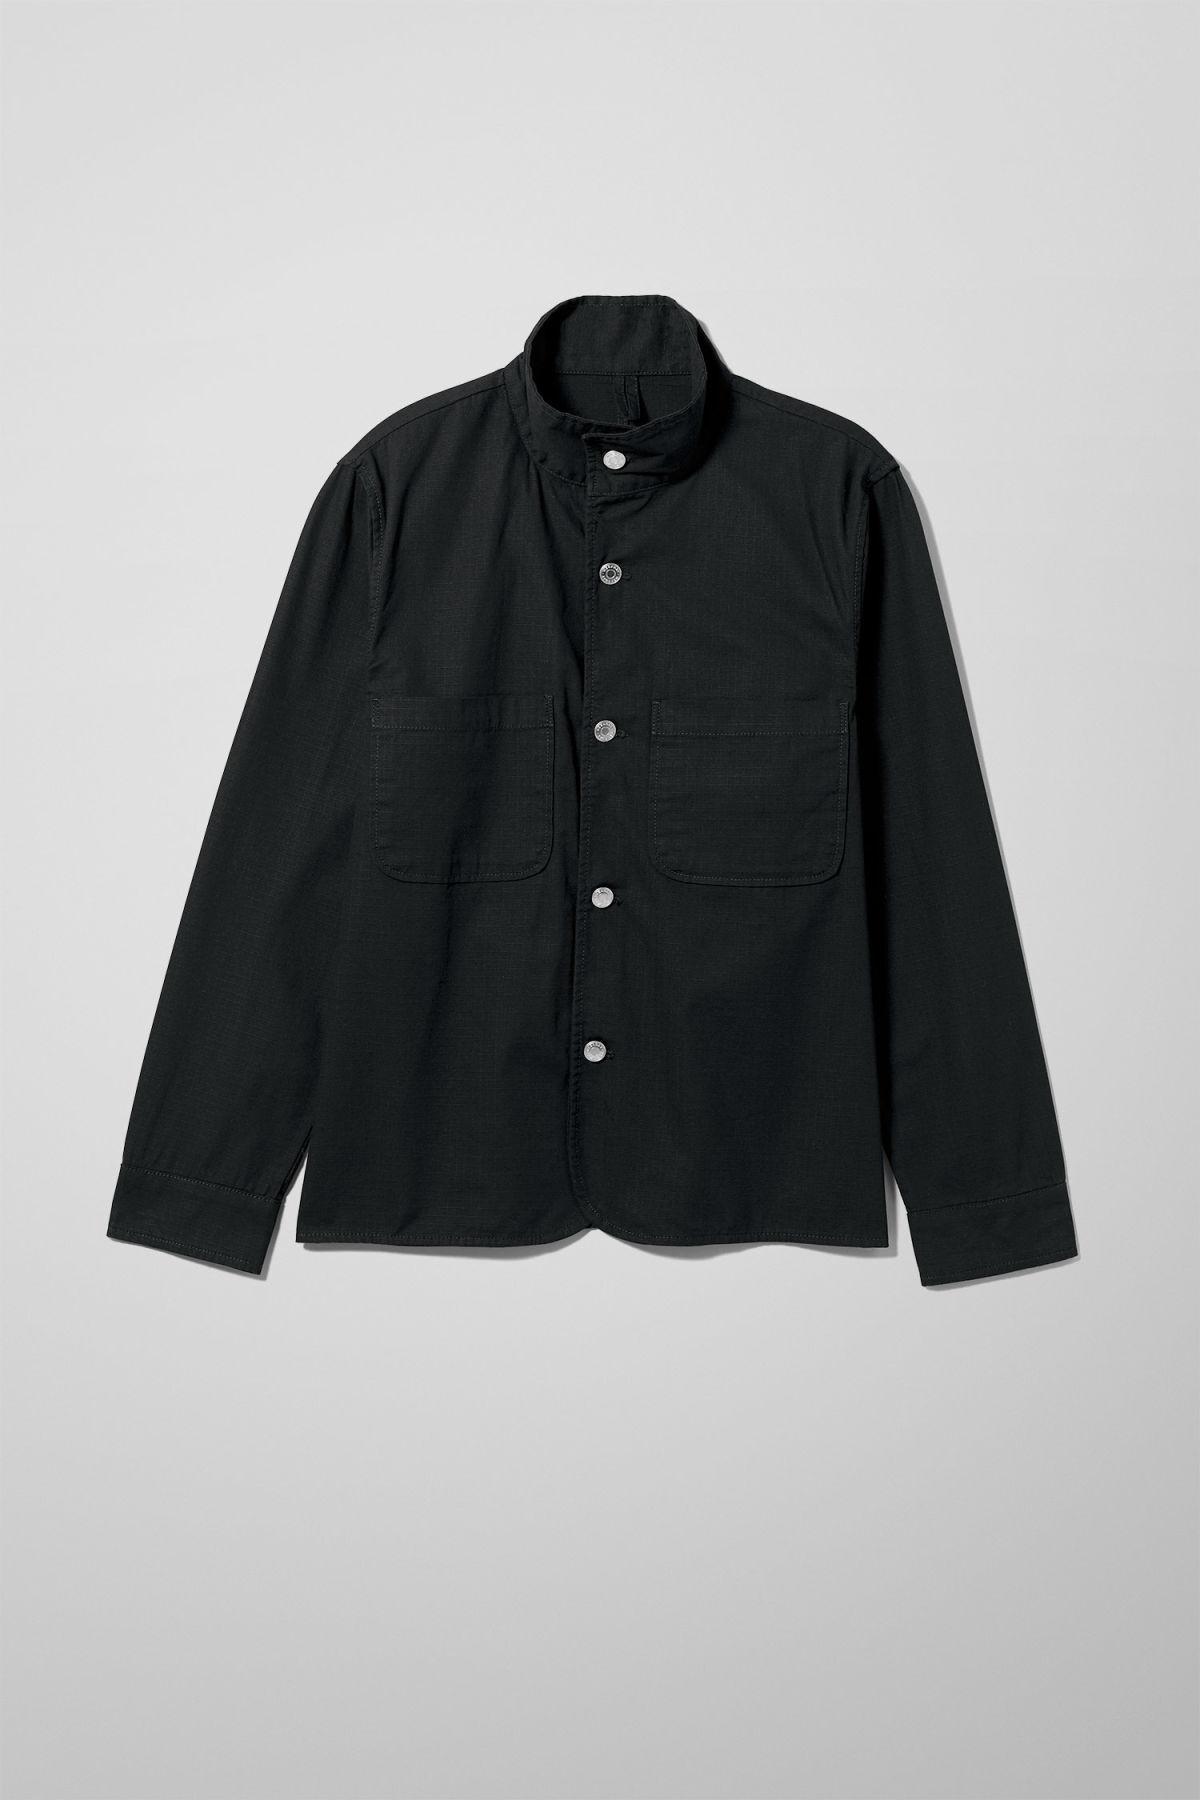 Image of Hector Jacket - Black-XL